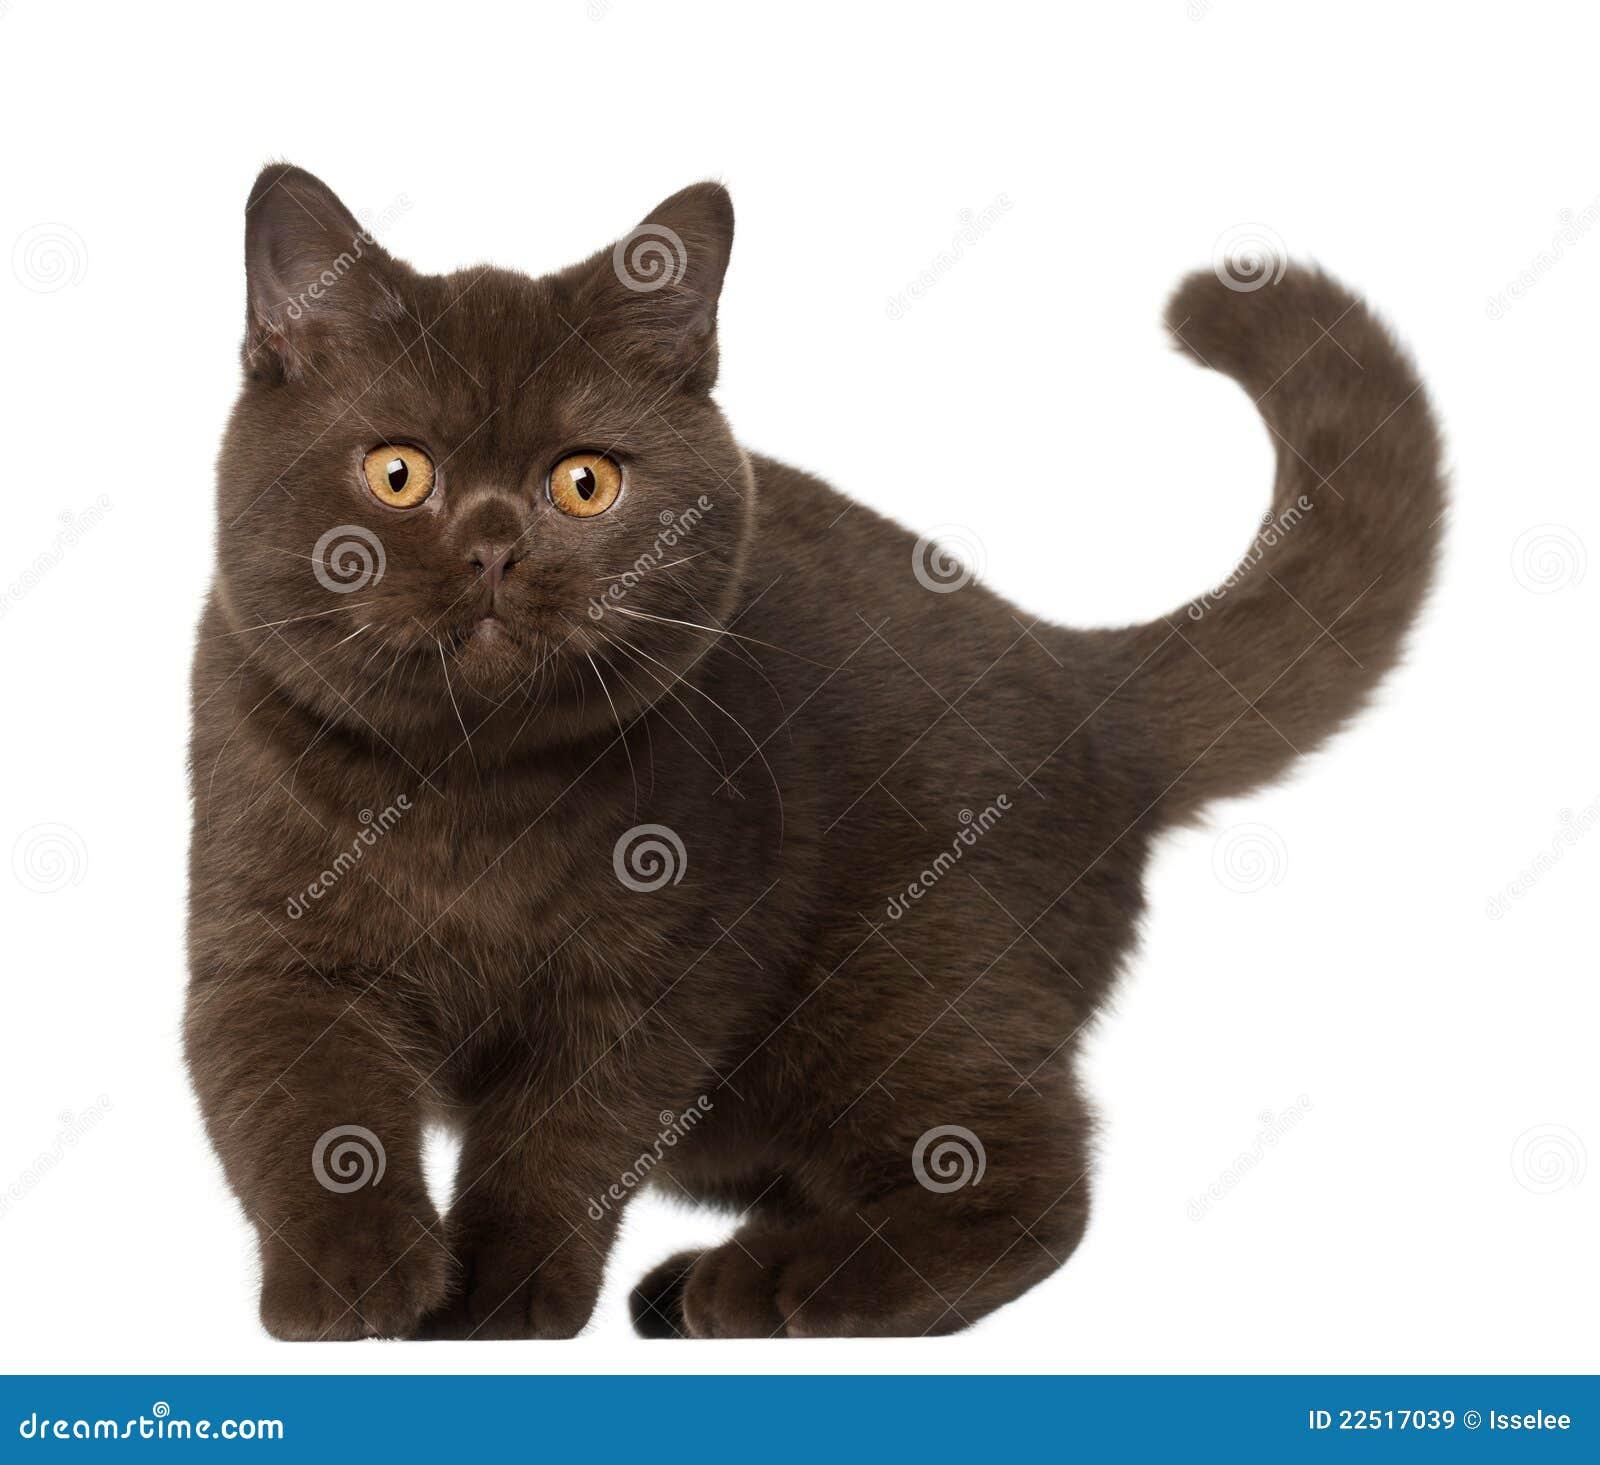 British Shorthair Cat Kitten 4 Months Old Stock Image Image